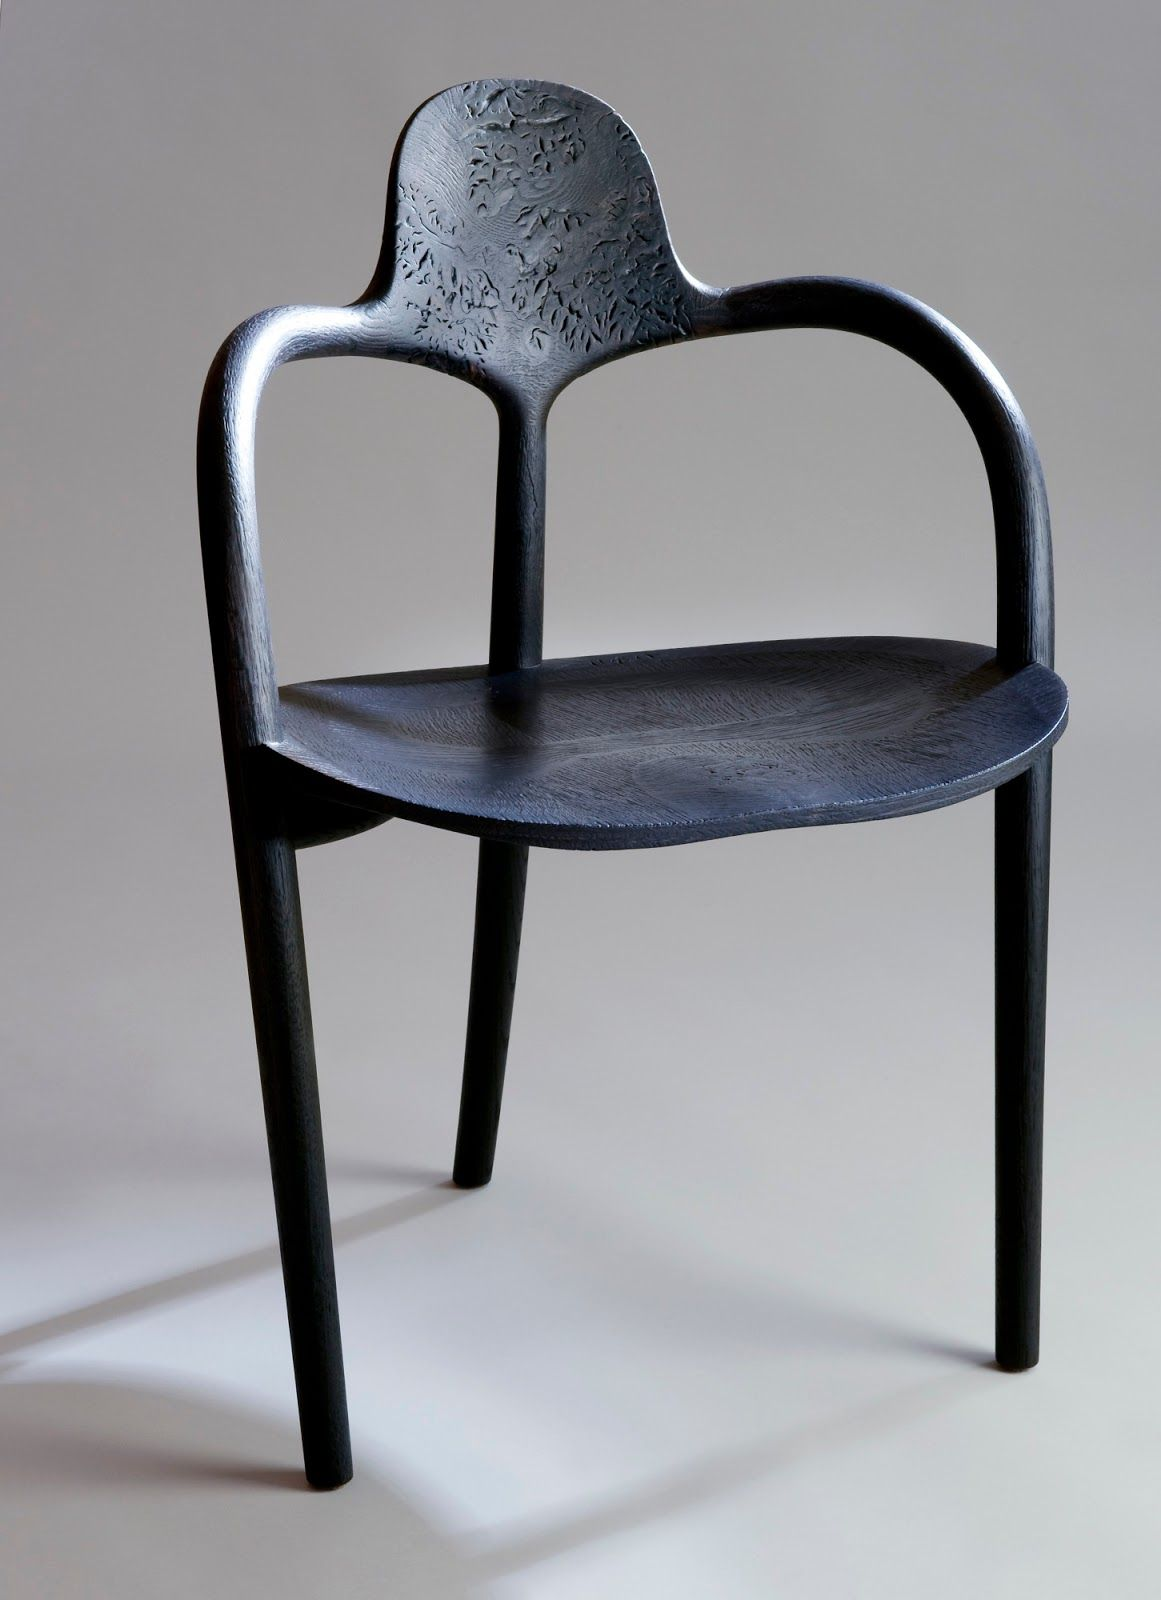 Trine Chair By John Makepeace 인테리어